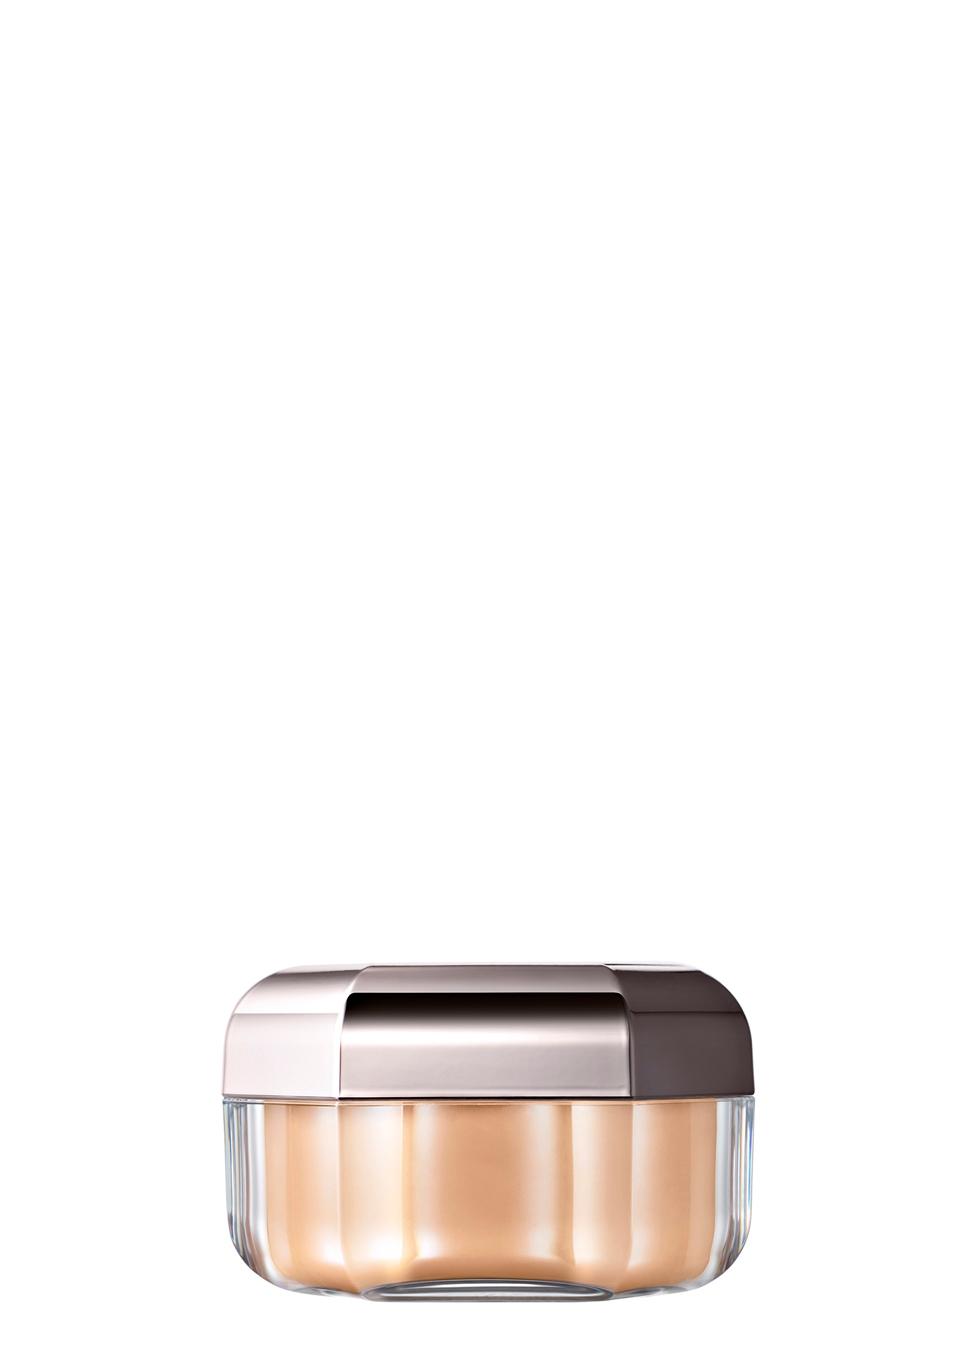 Pro Filt'r Instant Retouch Setting Powder - Cashew - FENTY BEAUTY